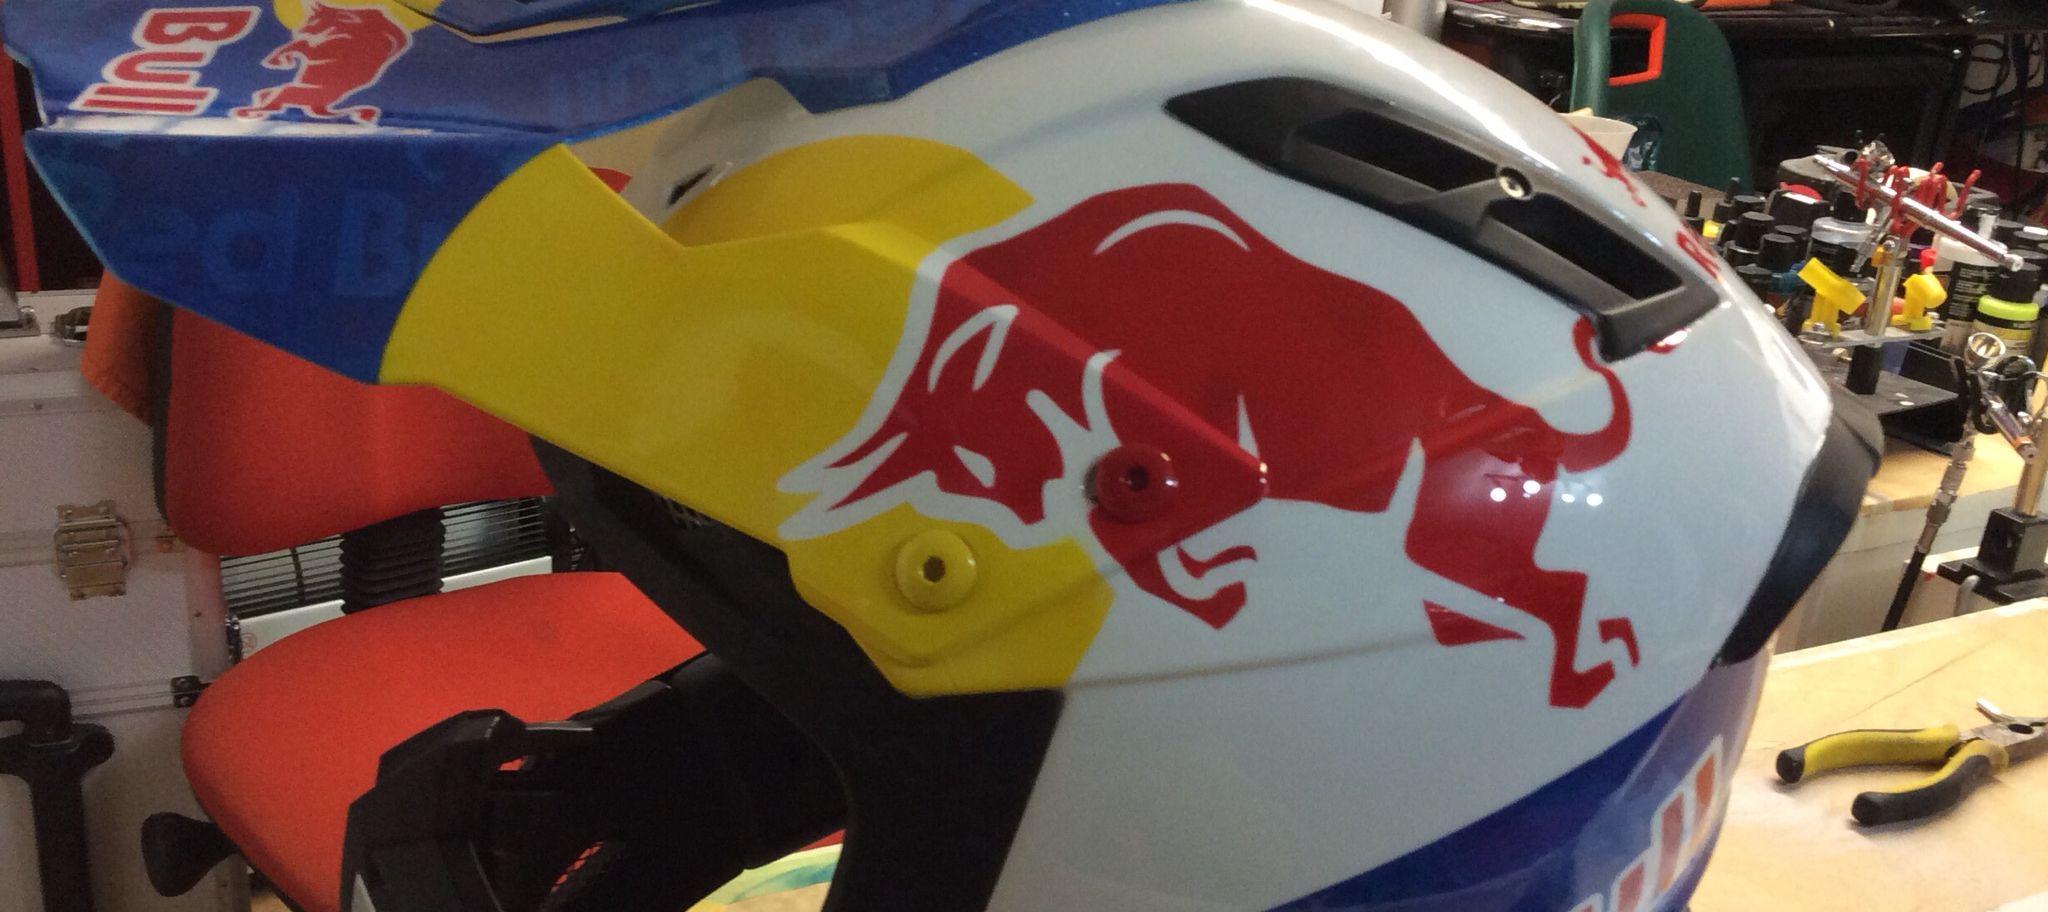 Red Bull theme 02